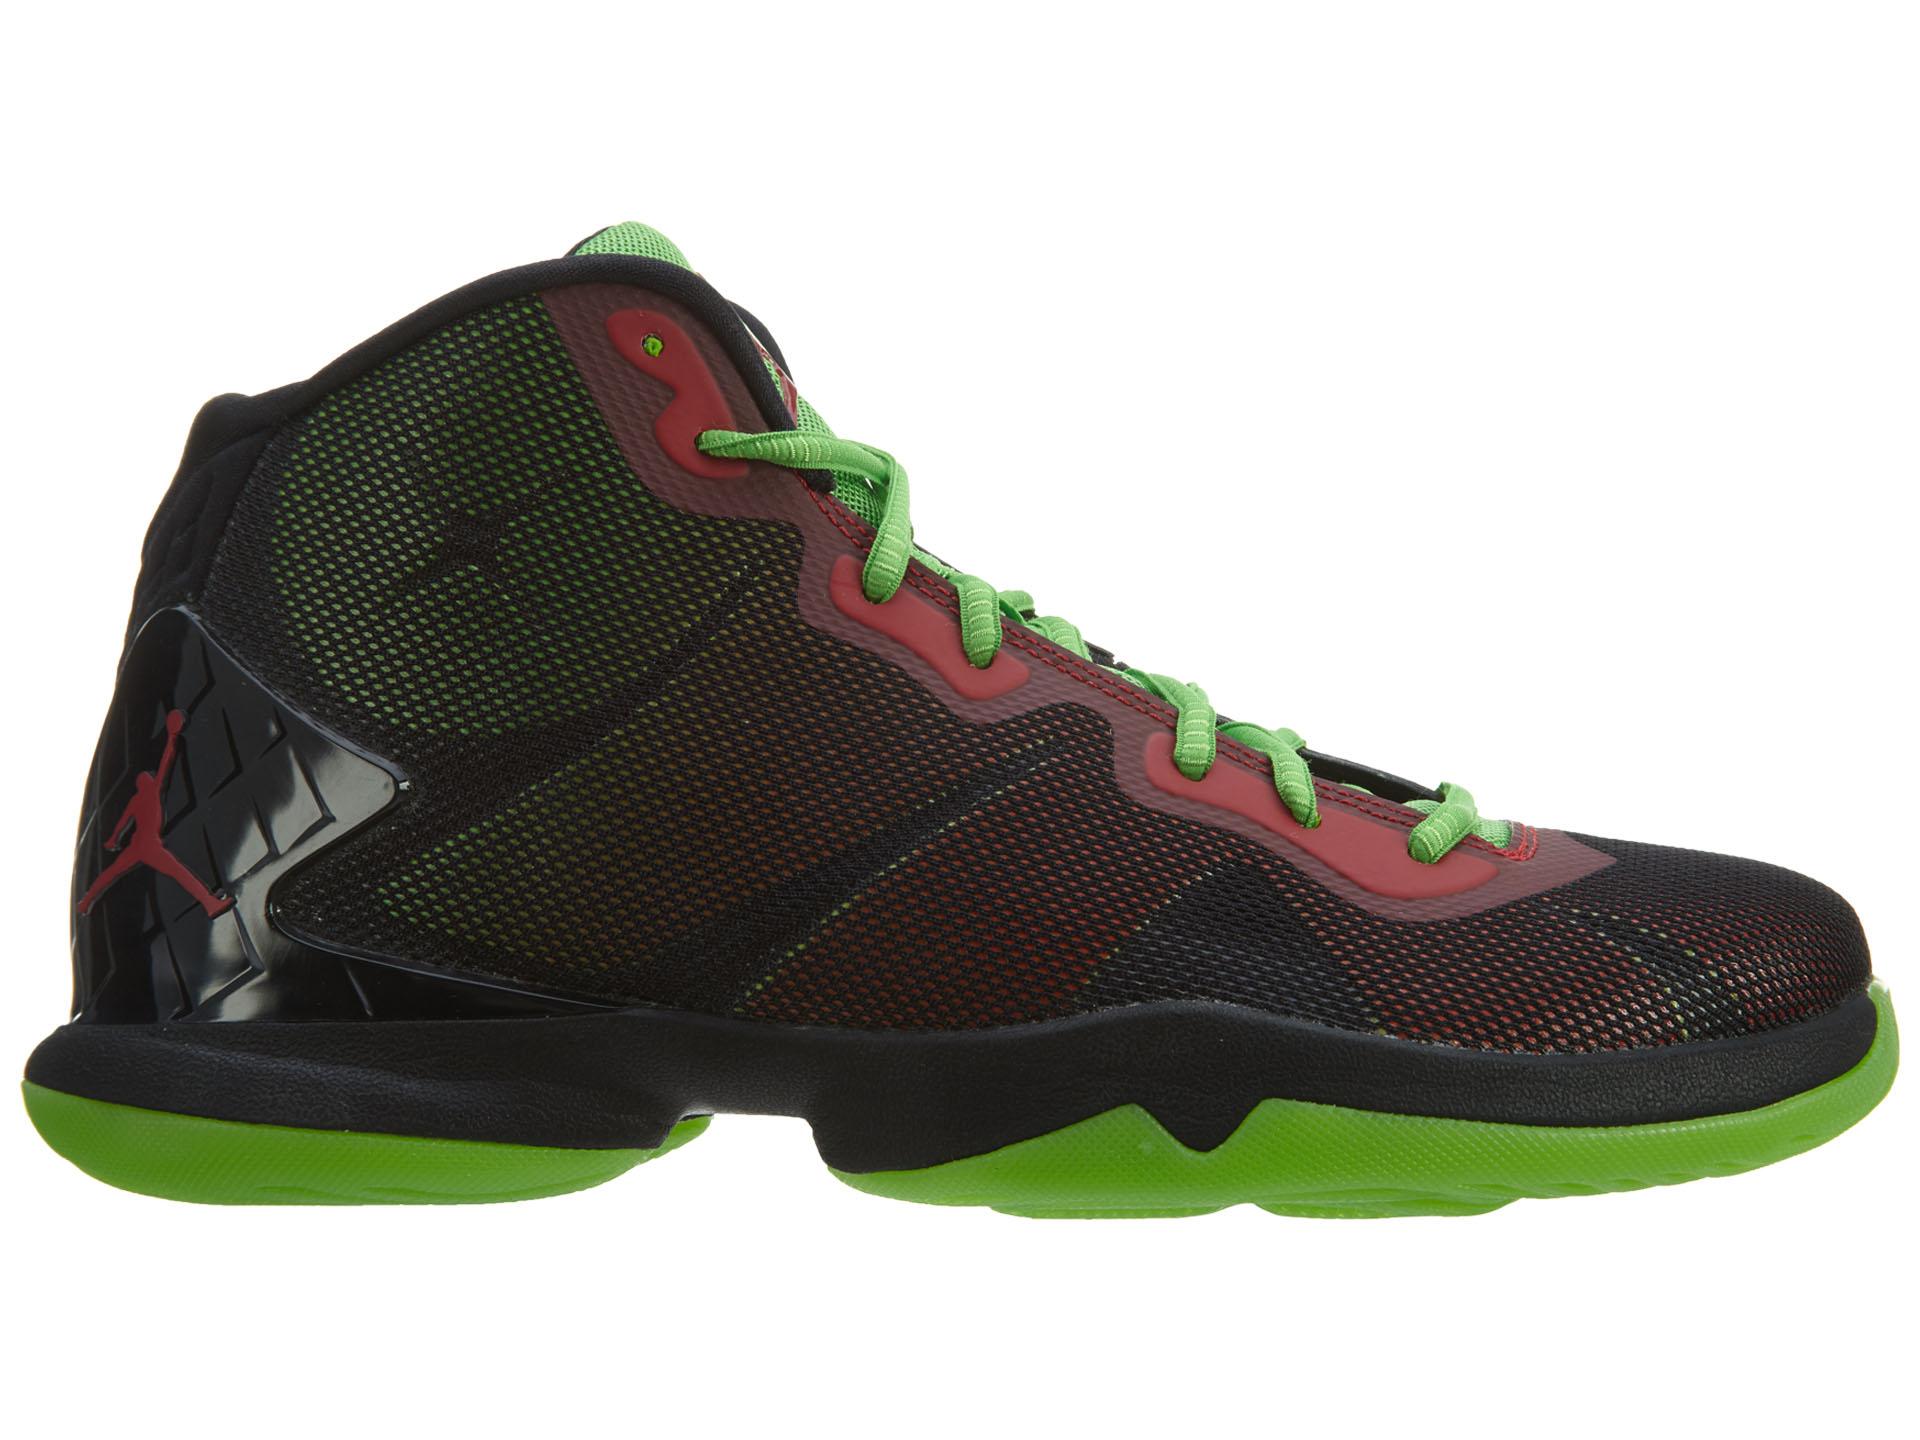 Jordan Super.Fly 4 Black/Gym Red-Green